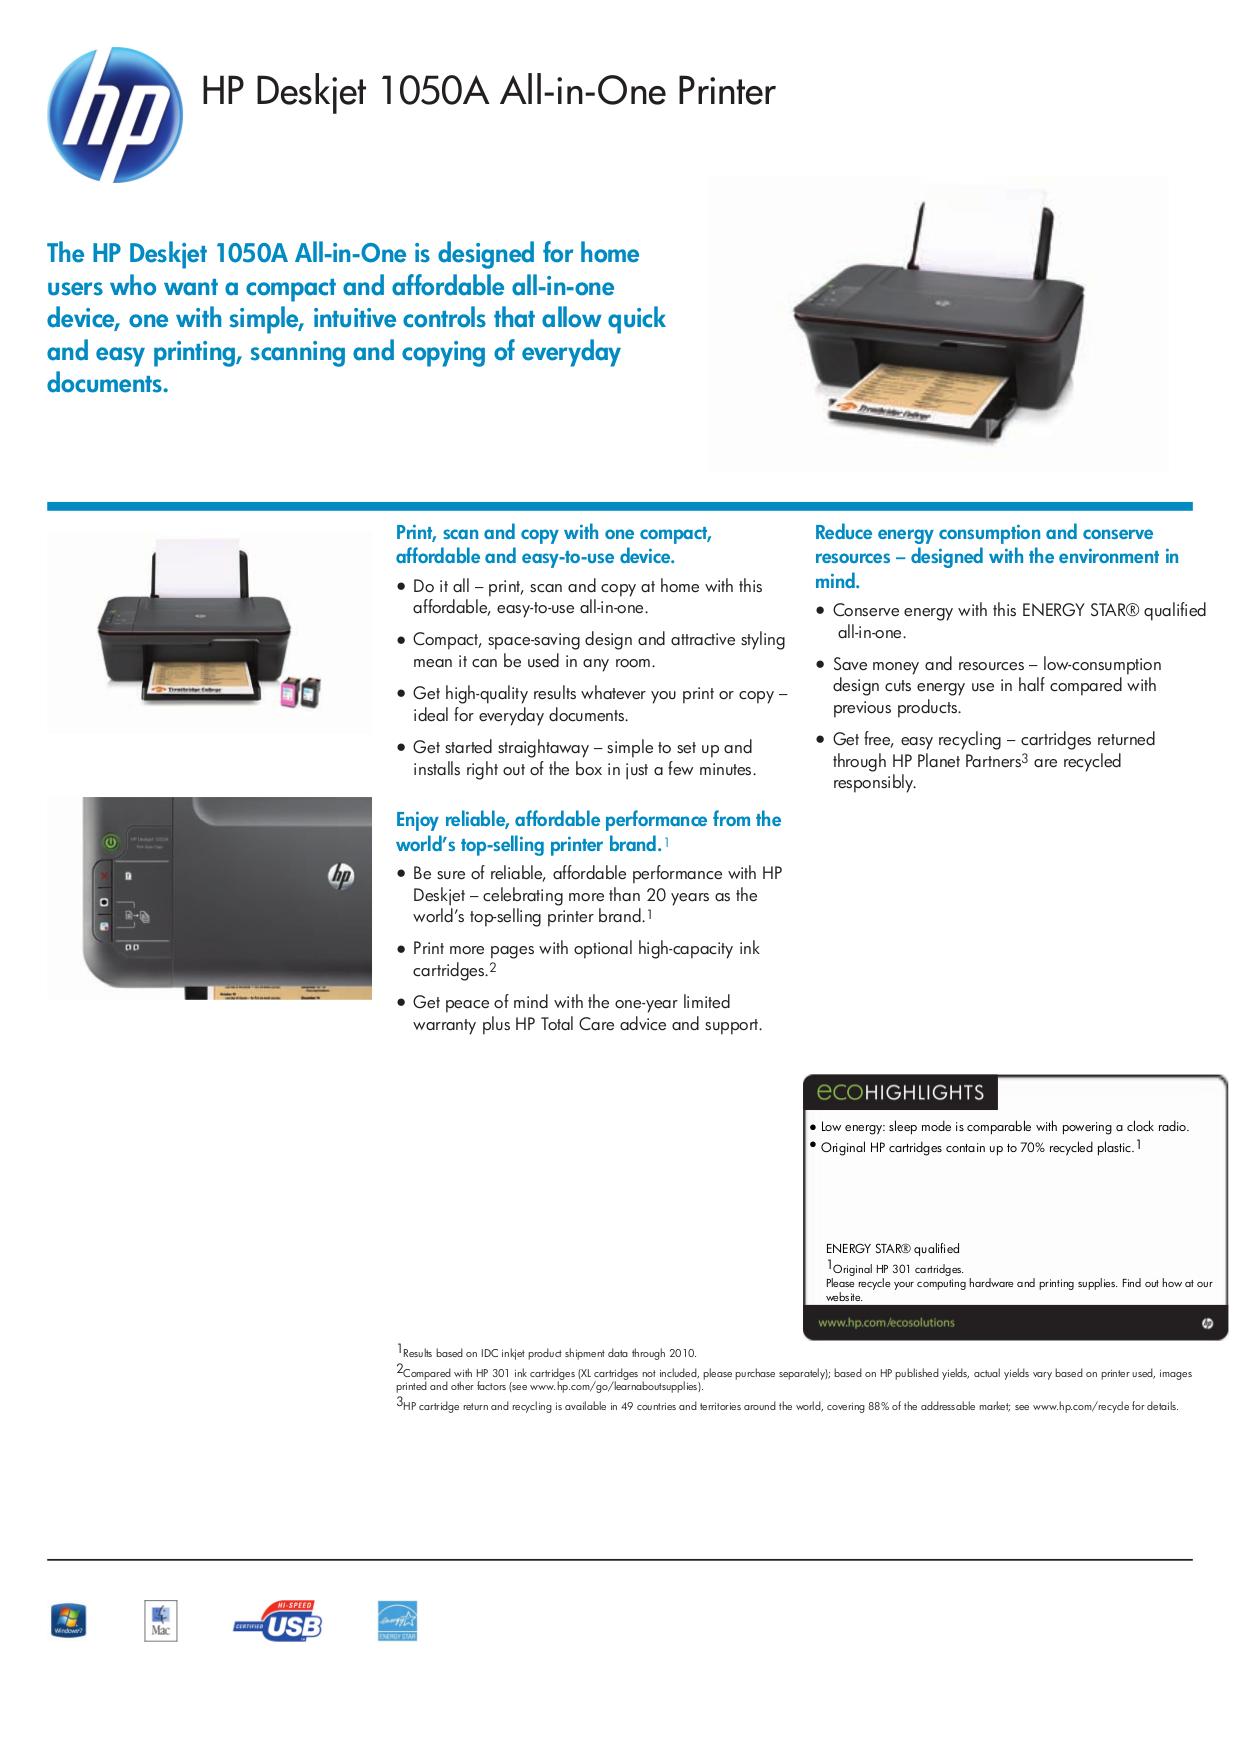 pdf for HP Multifunction Printer Deskjet 1050 manual